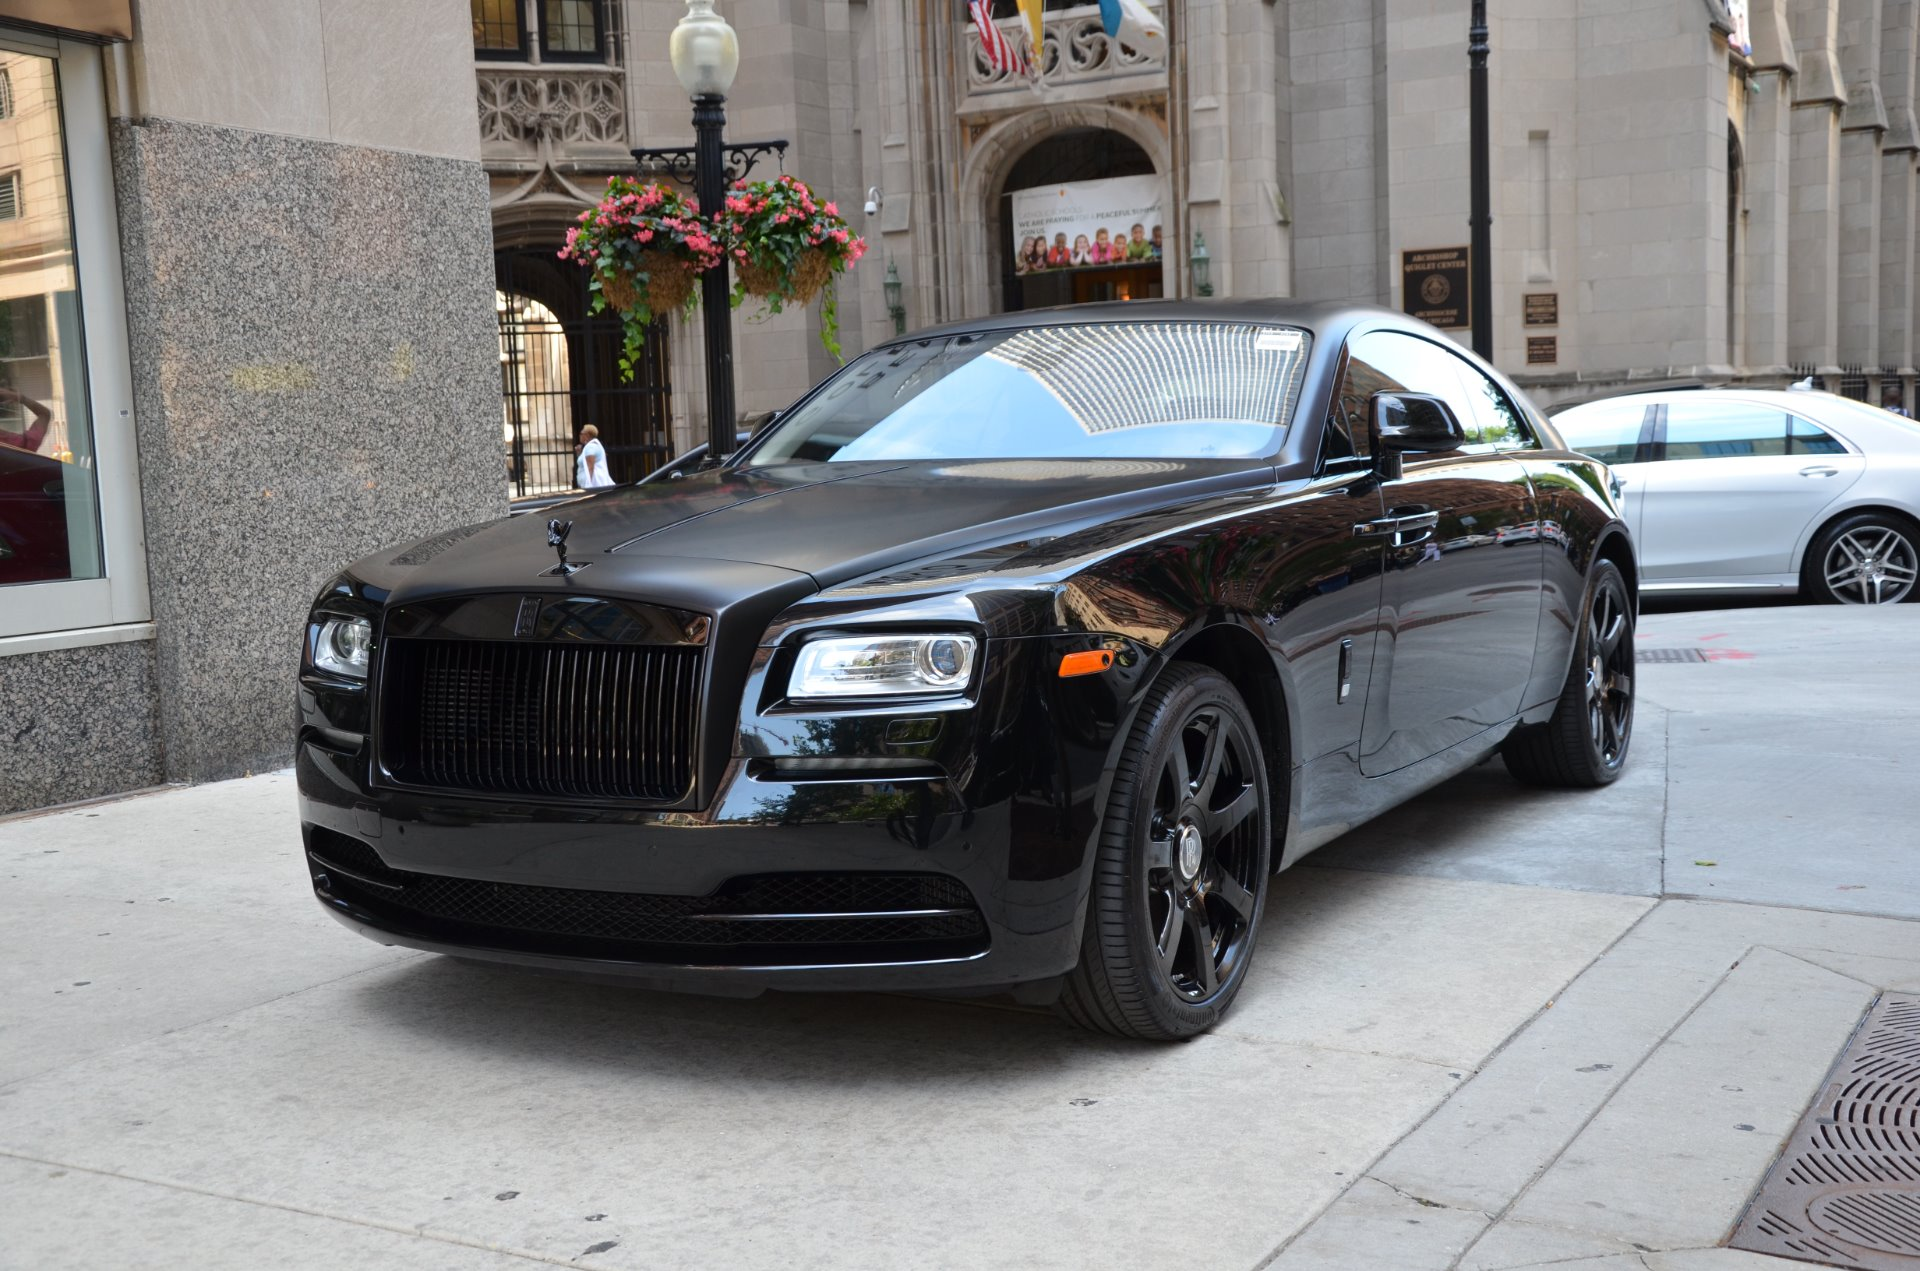 2016 rolls-royce wraith stock # gc-olena86256 for sale near chicago